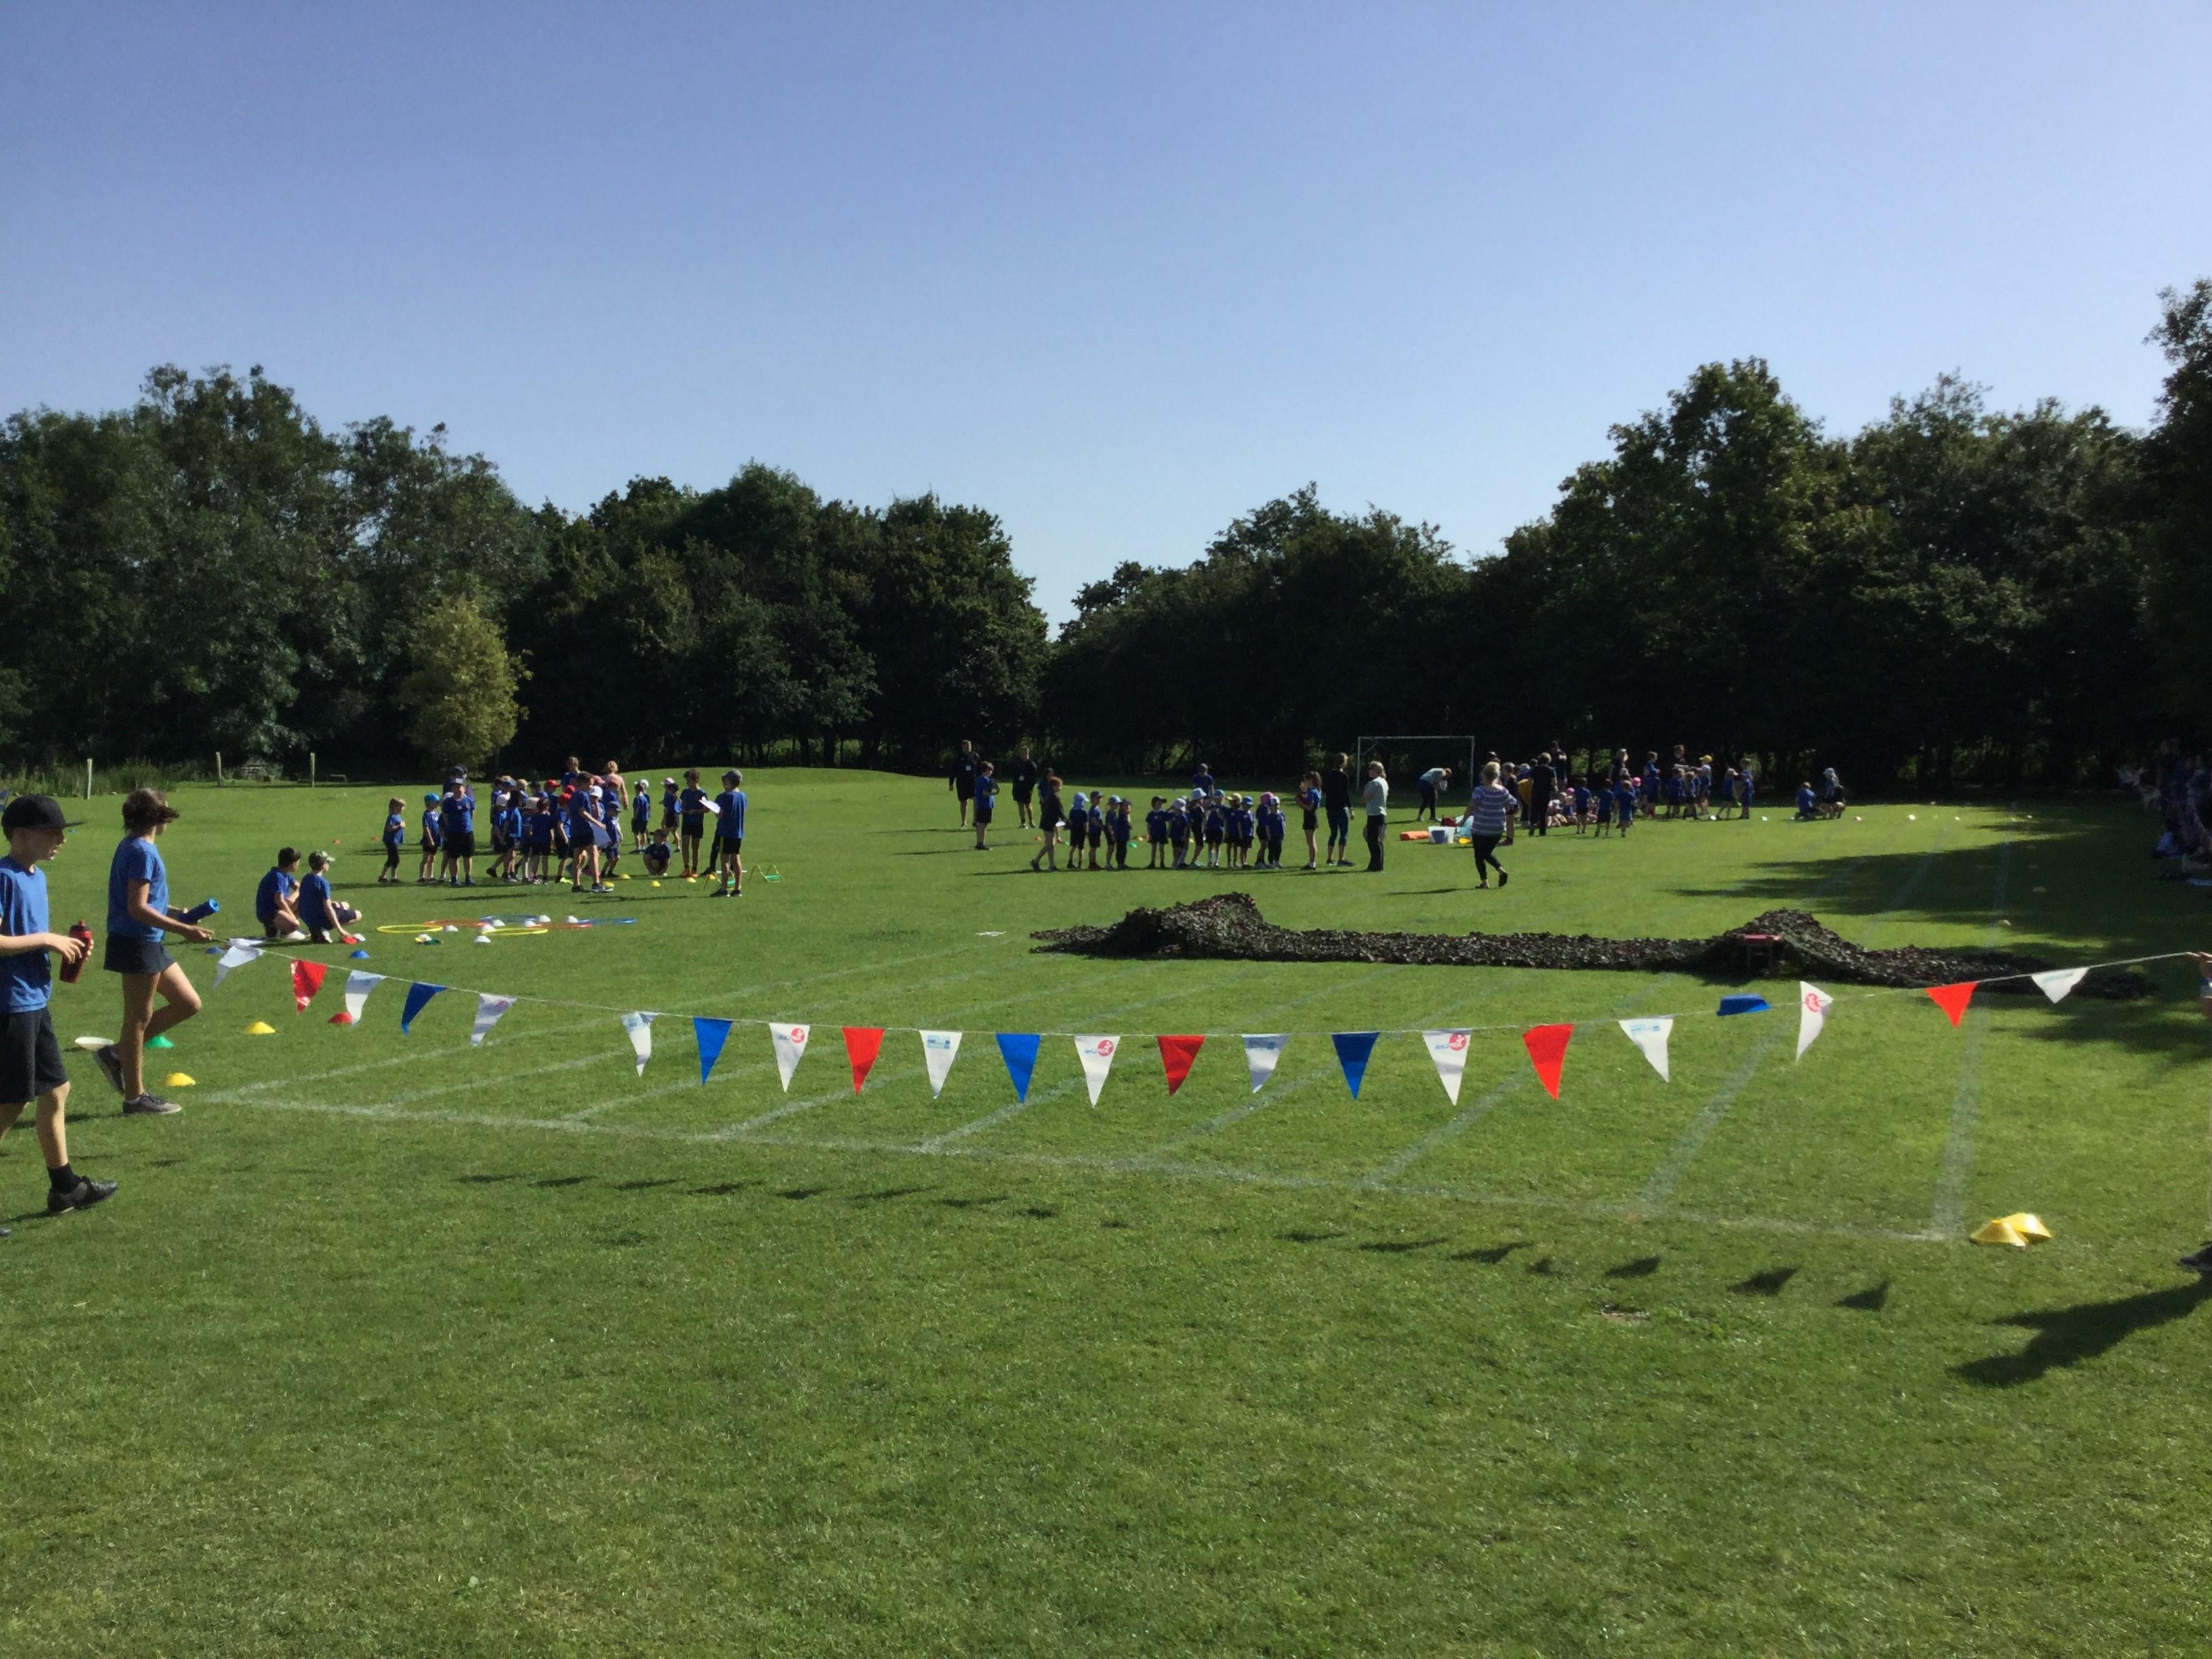 Fantastic Sunny Sports Day at Bathampton Primary School